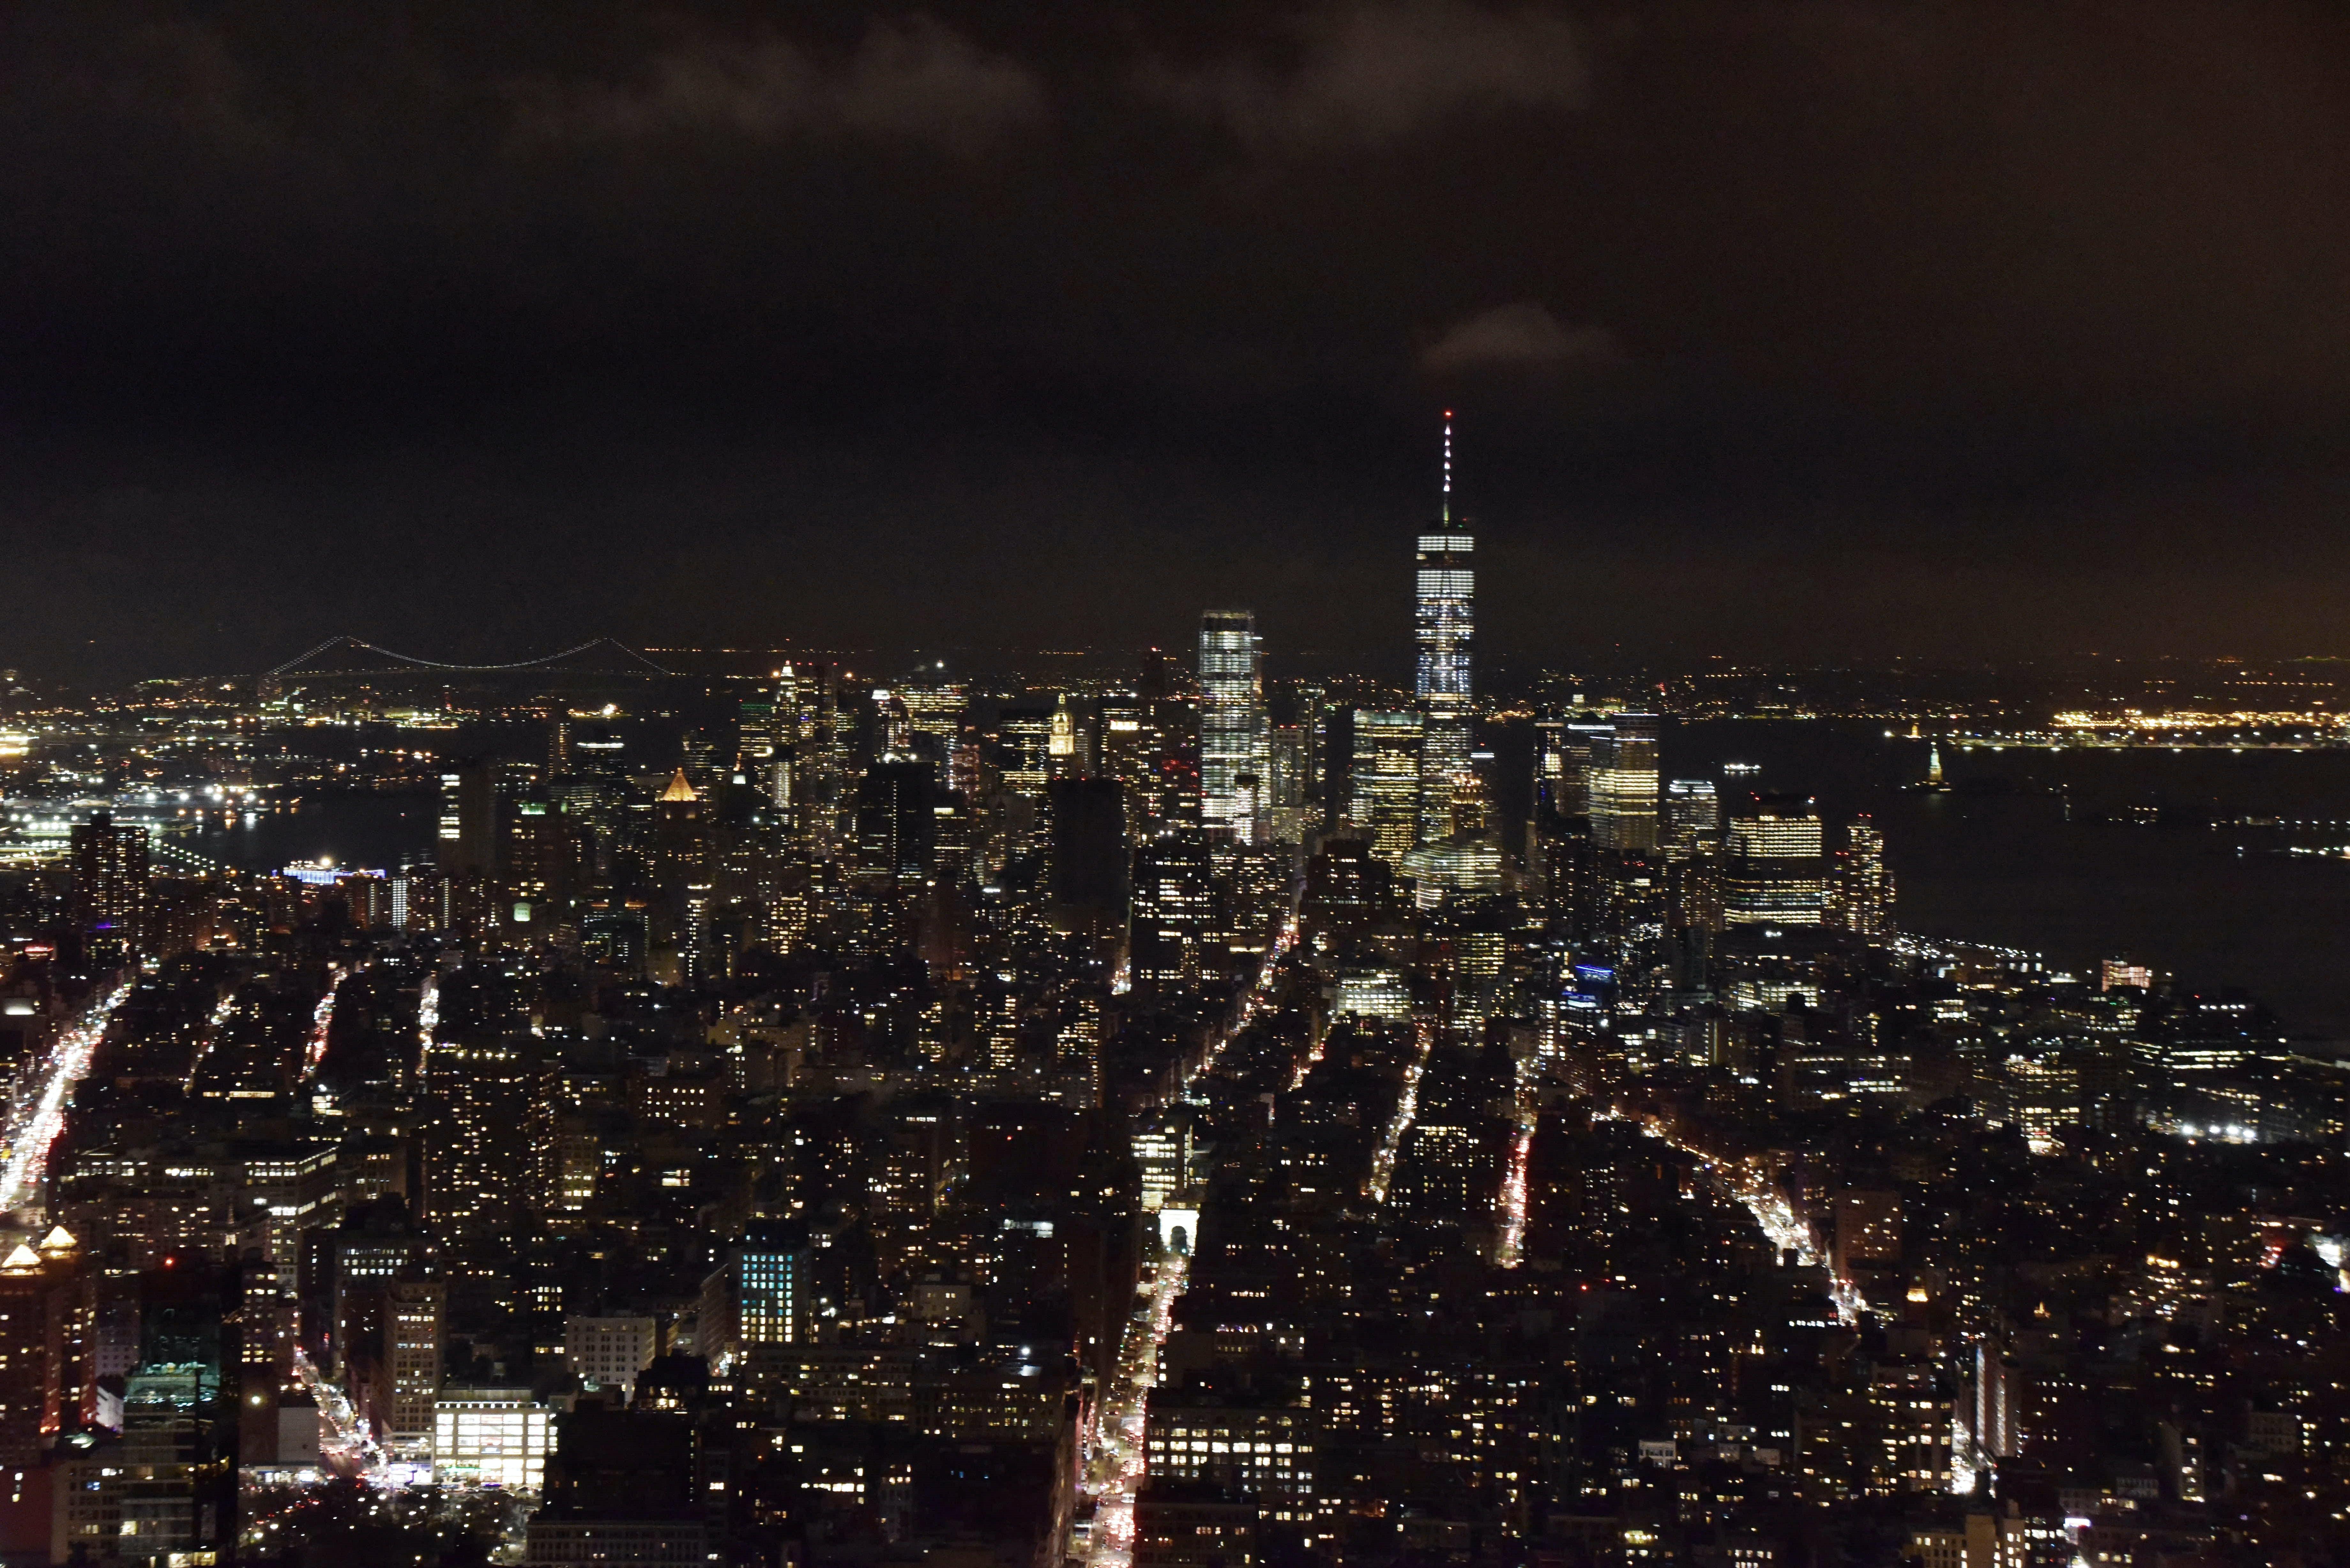 Free stock photo of night city